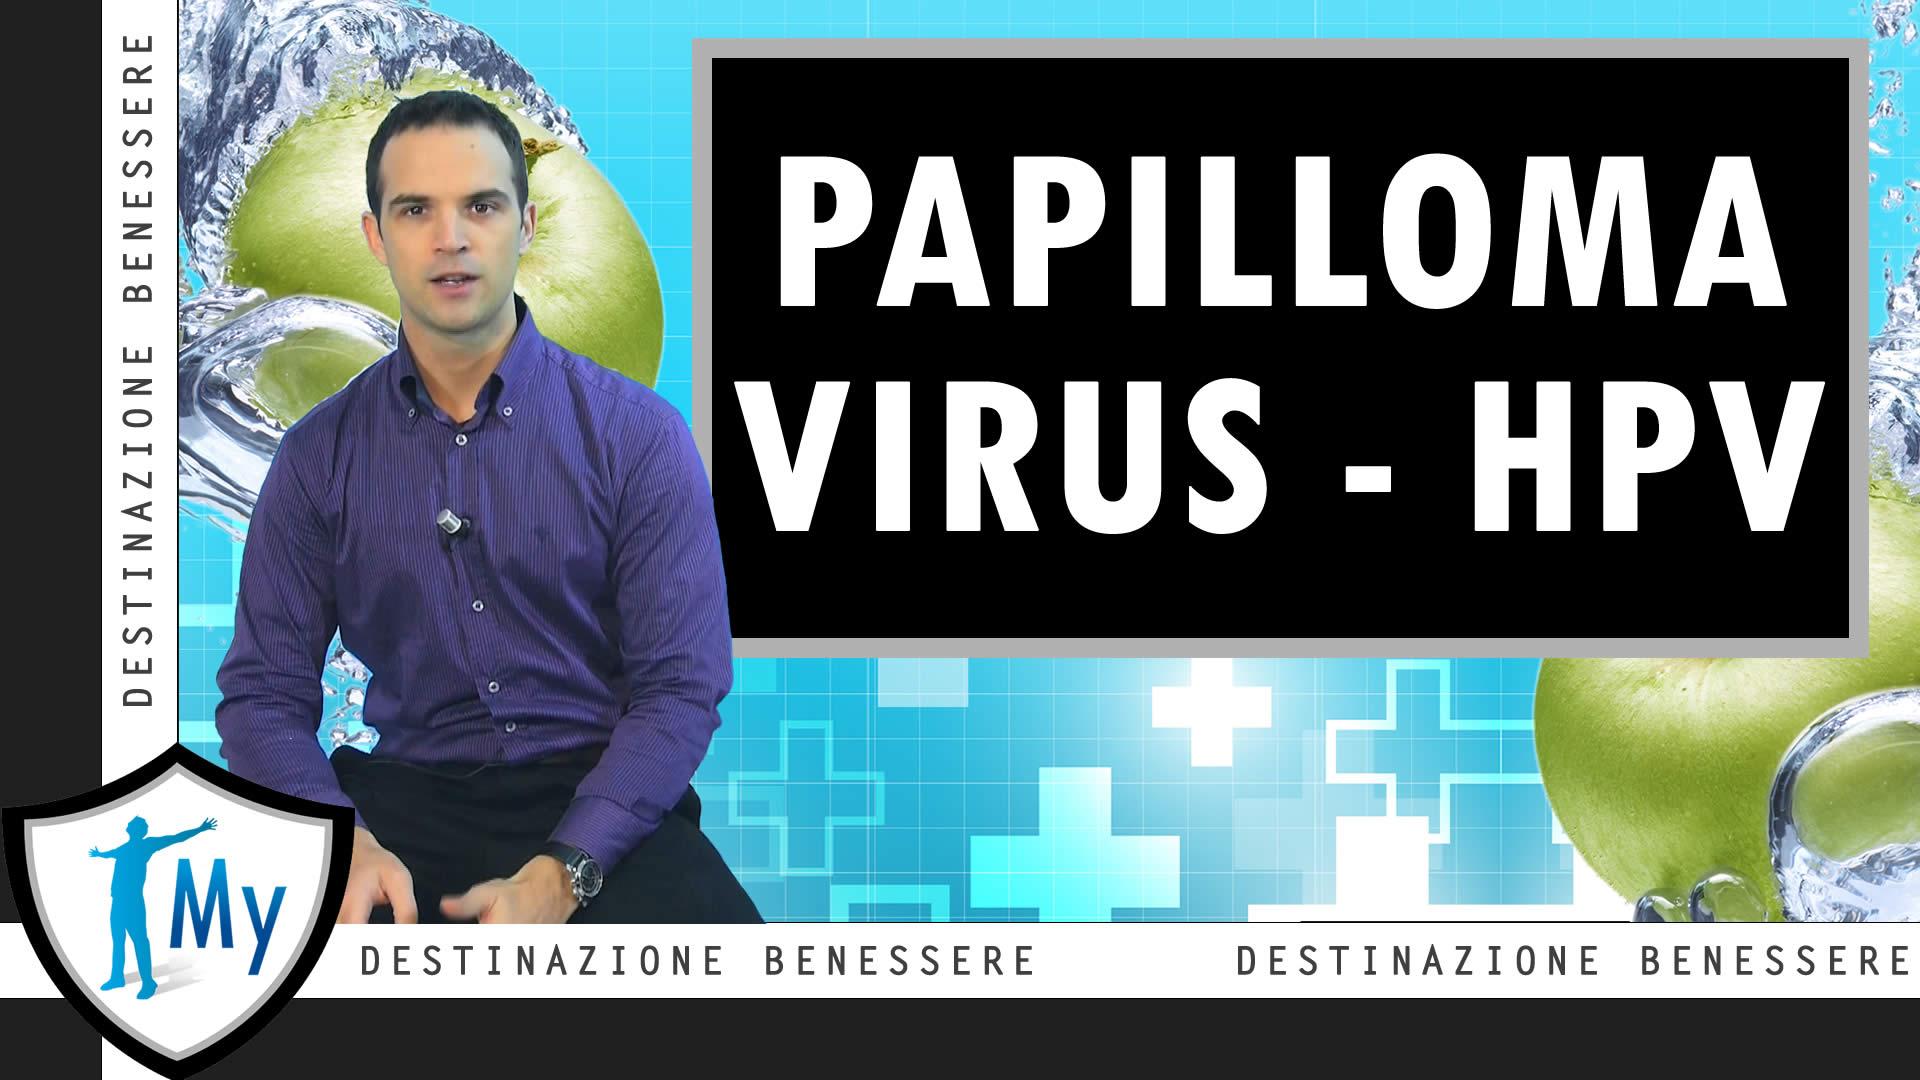 papilloma contagio bagno hpv high risk manner